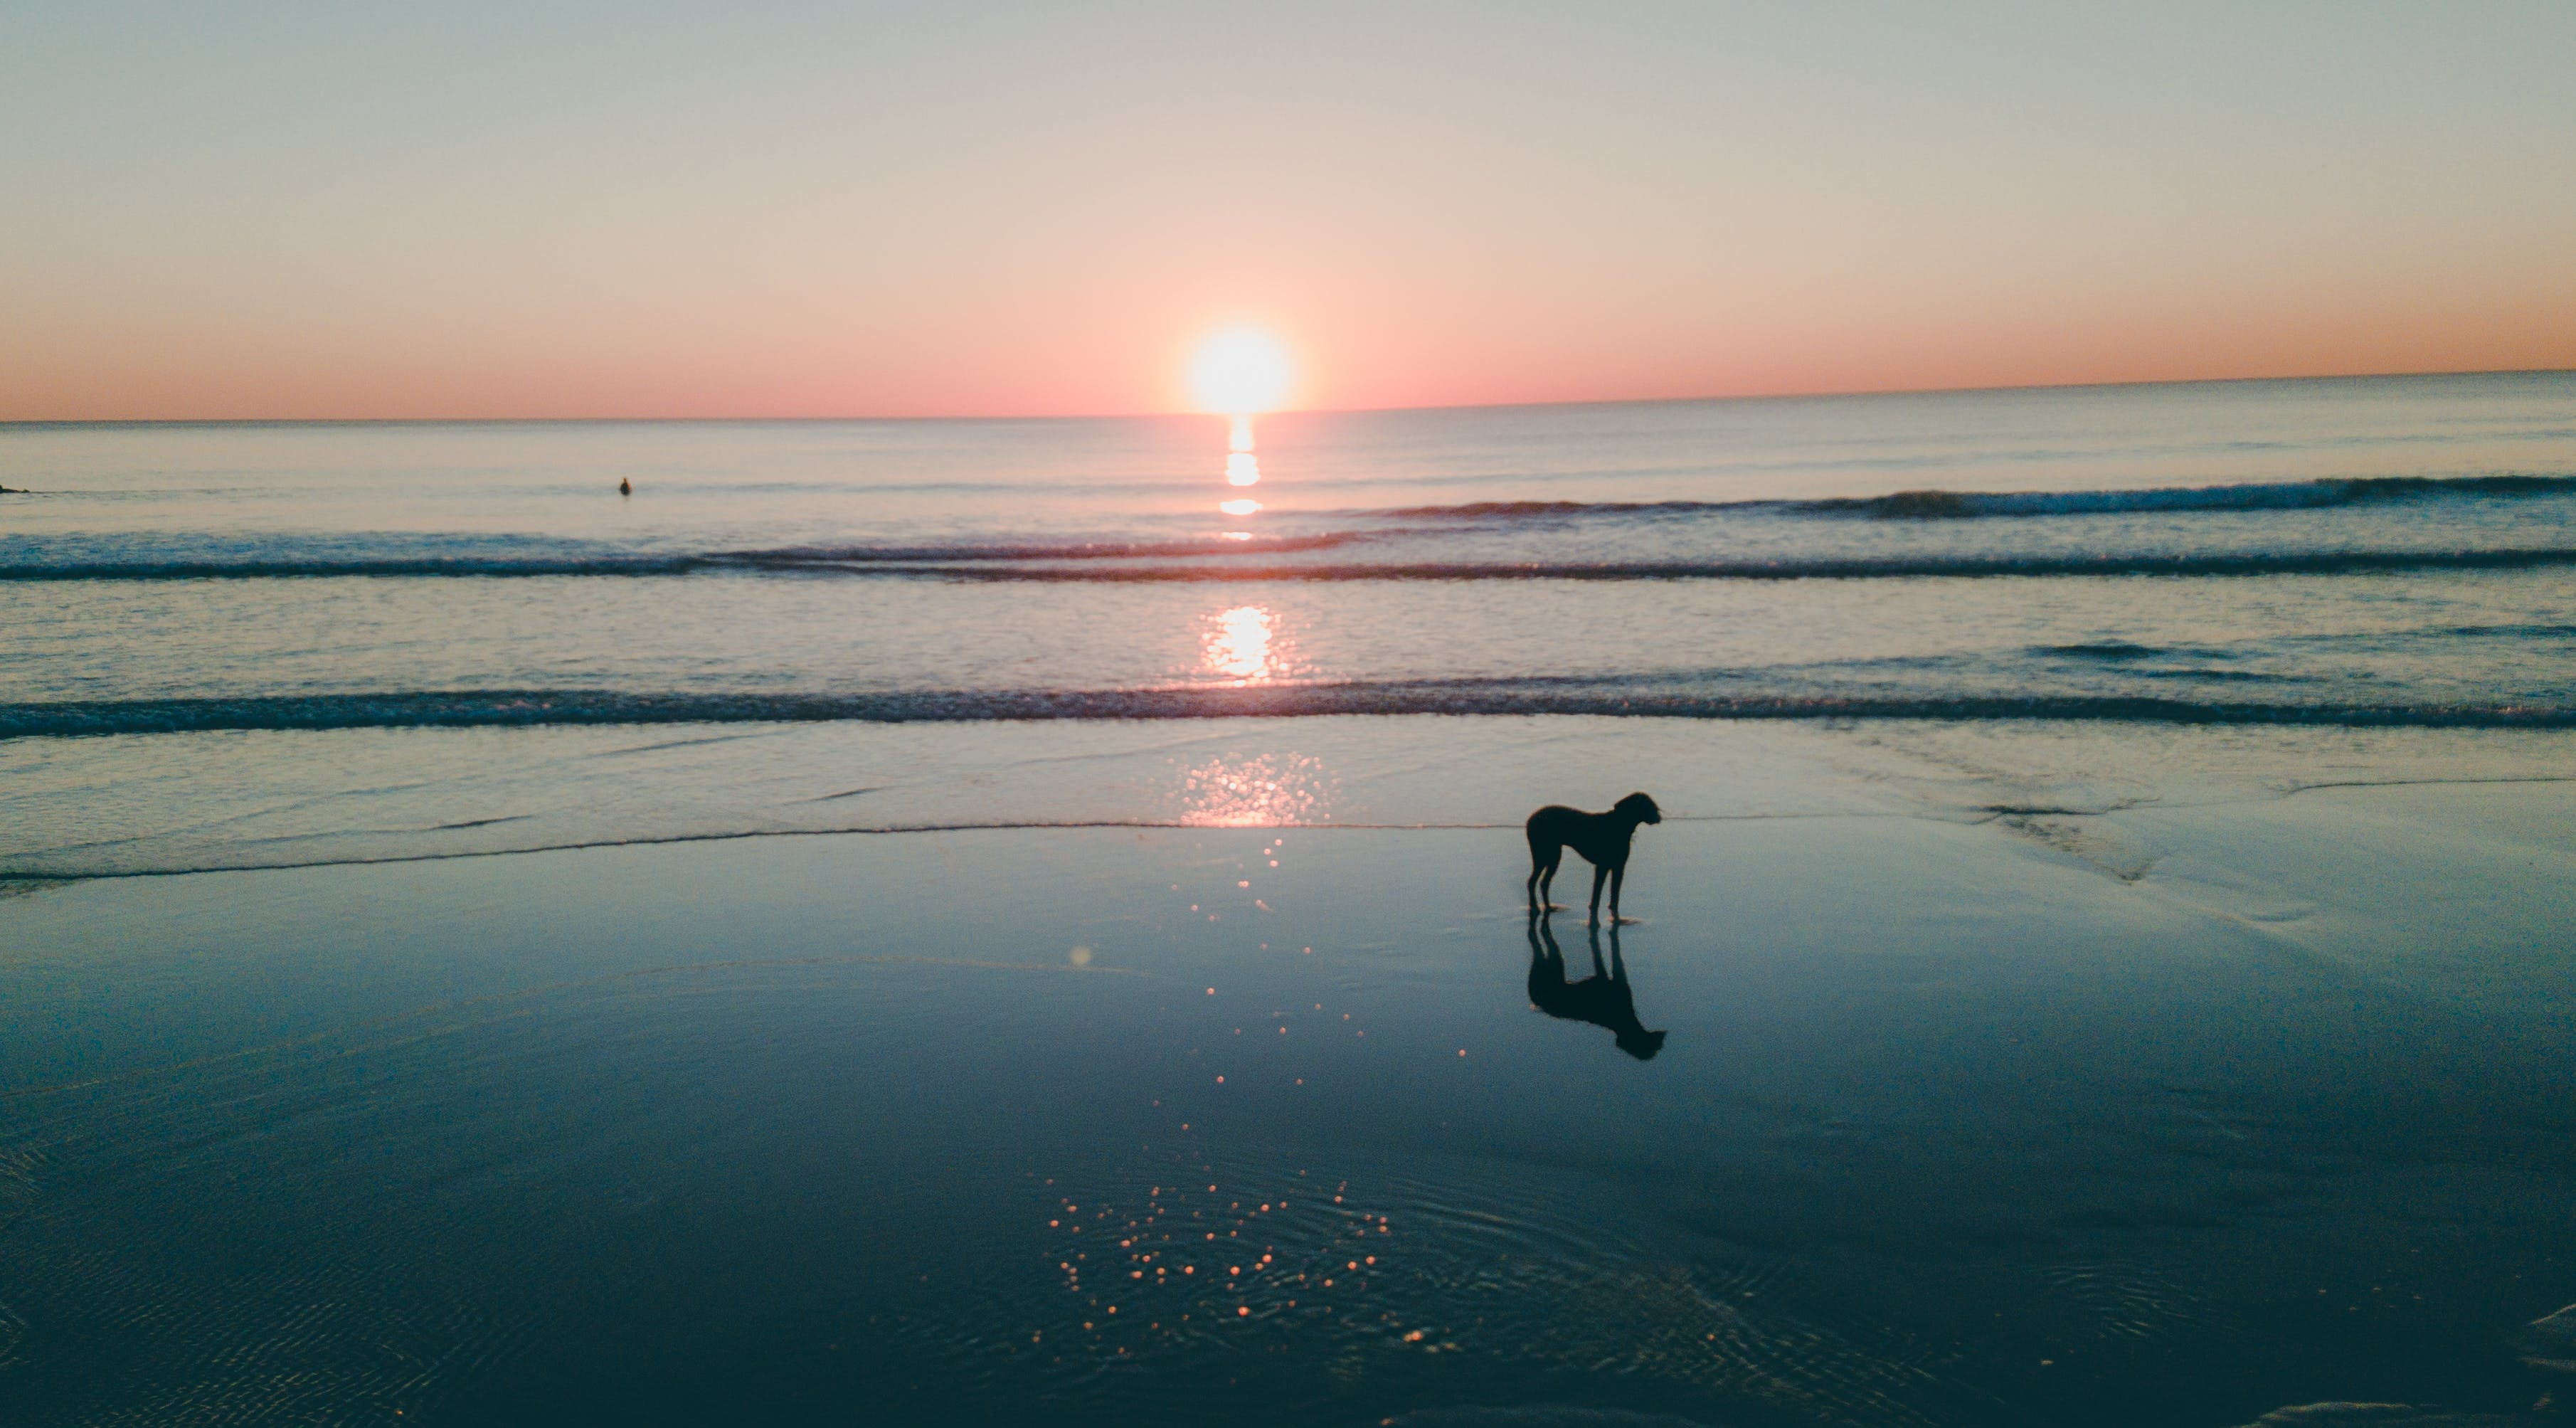 Fotos de stock gratuitas de amanecer, arena, cielo, costa